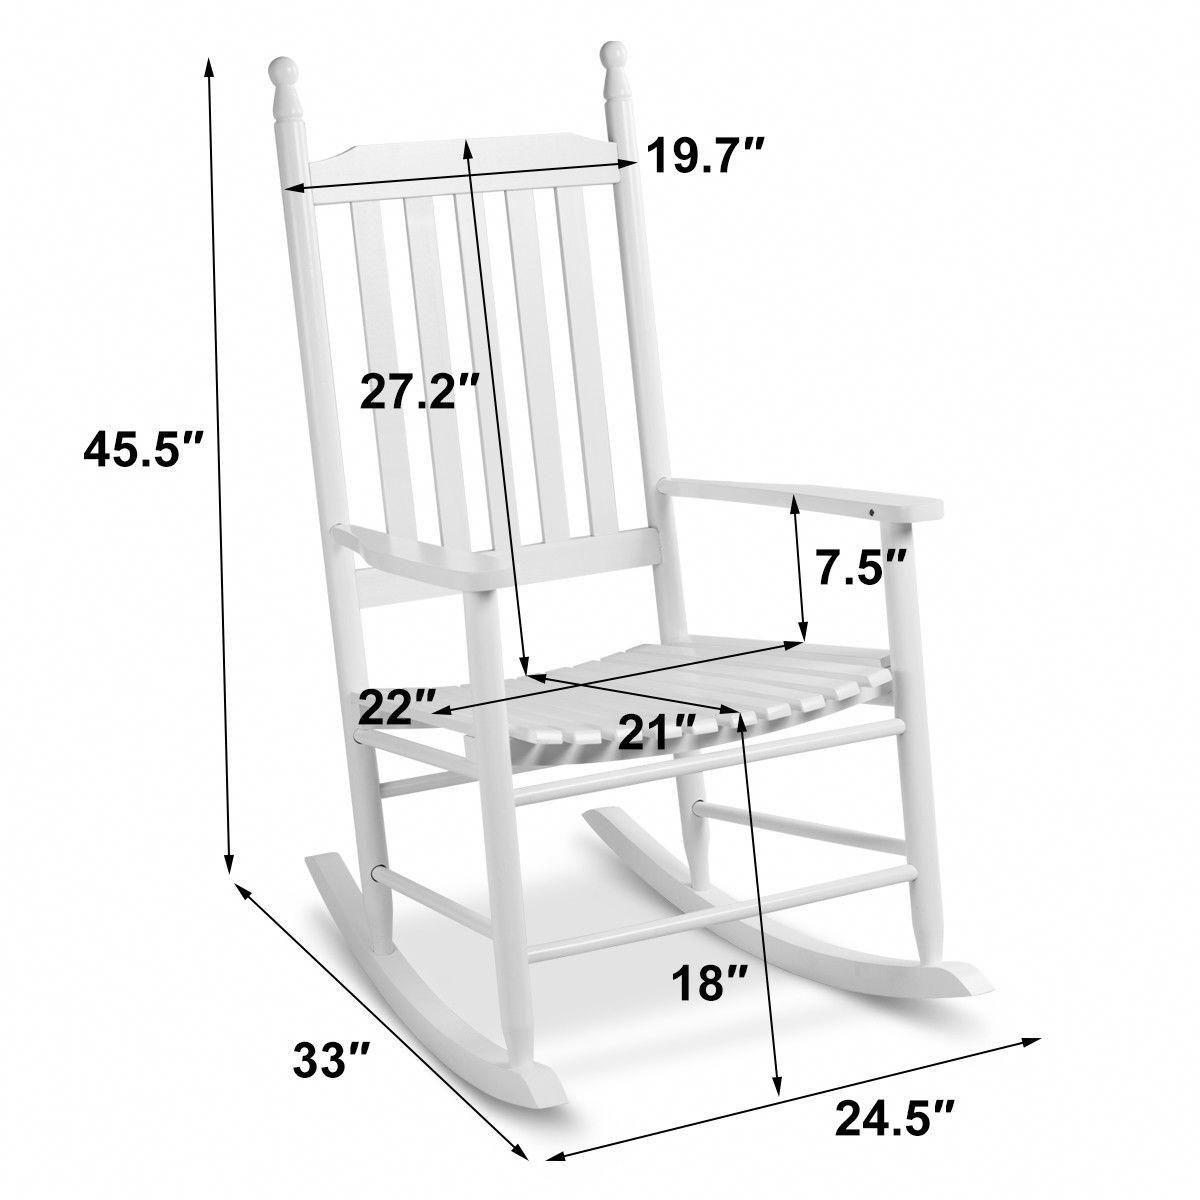 Wooden balcony deck garden porch armchair rocking chair